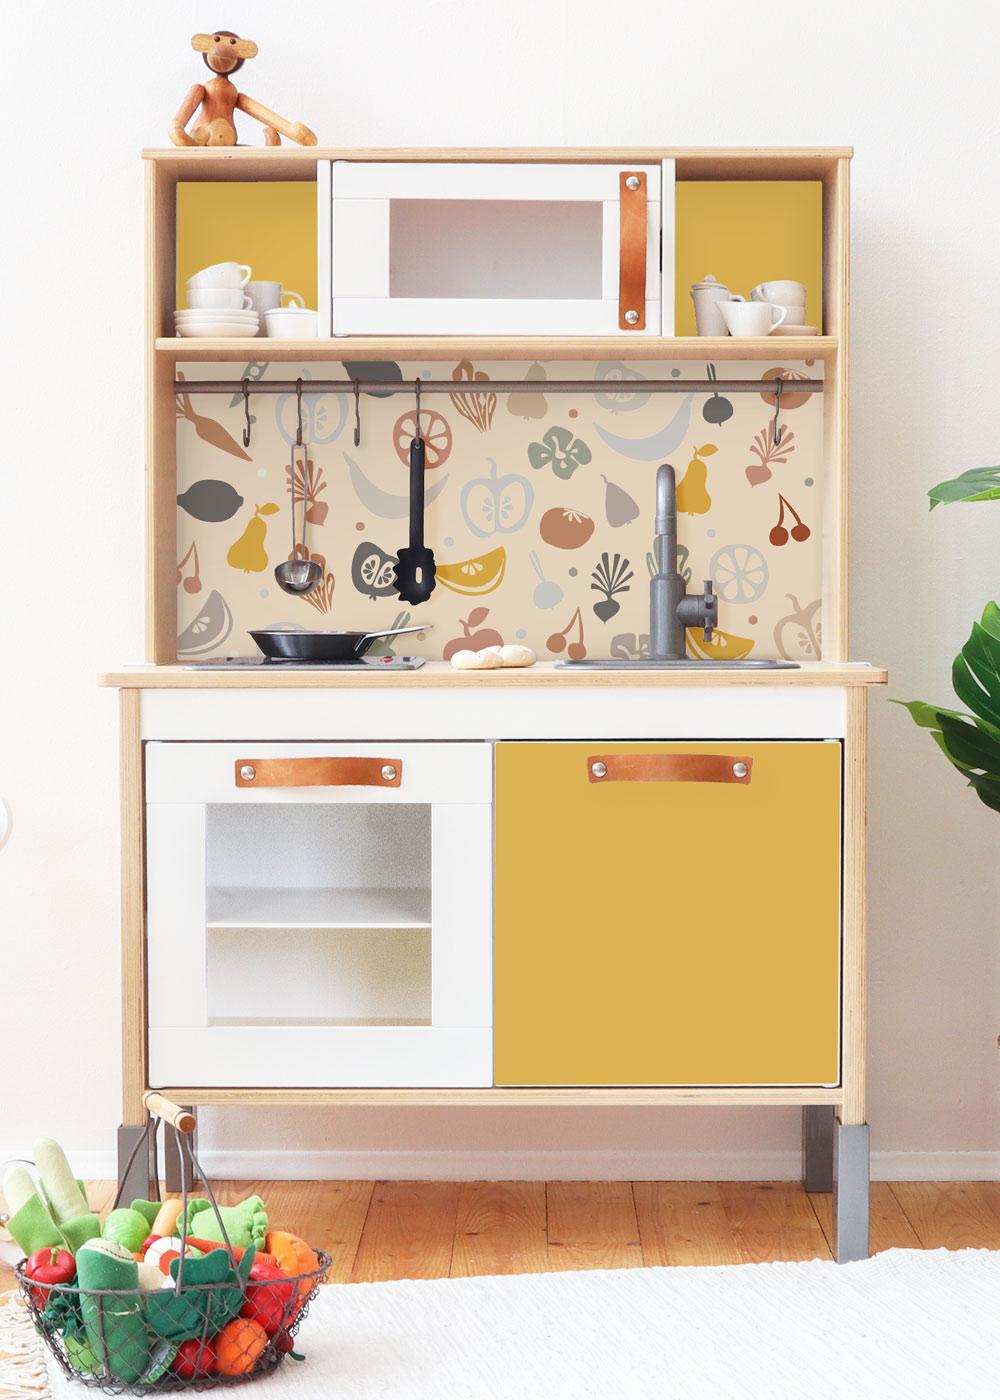 Ikea Duktig Kinderküche Fruktig Senf Frontansicht